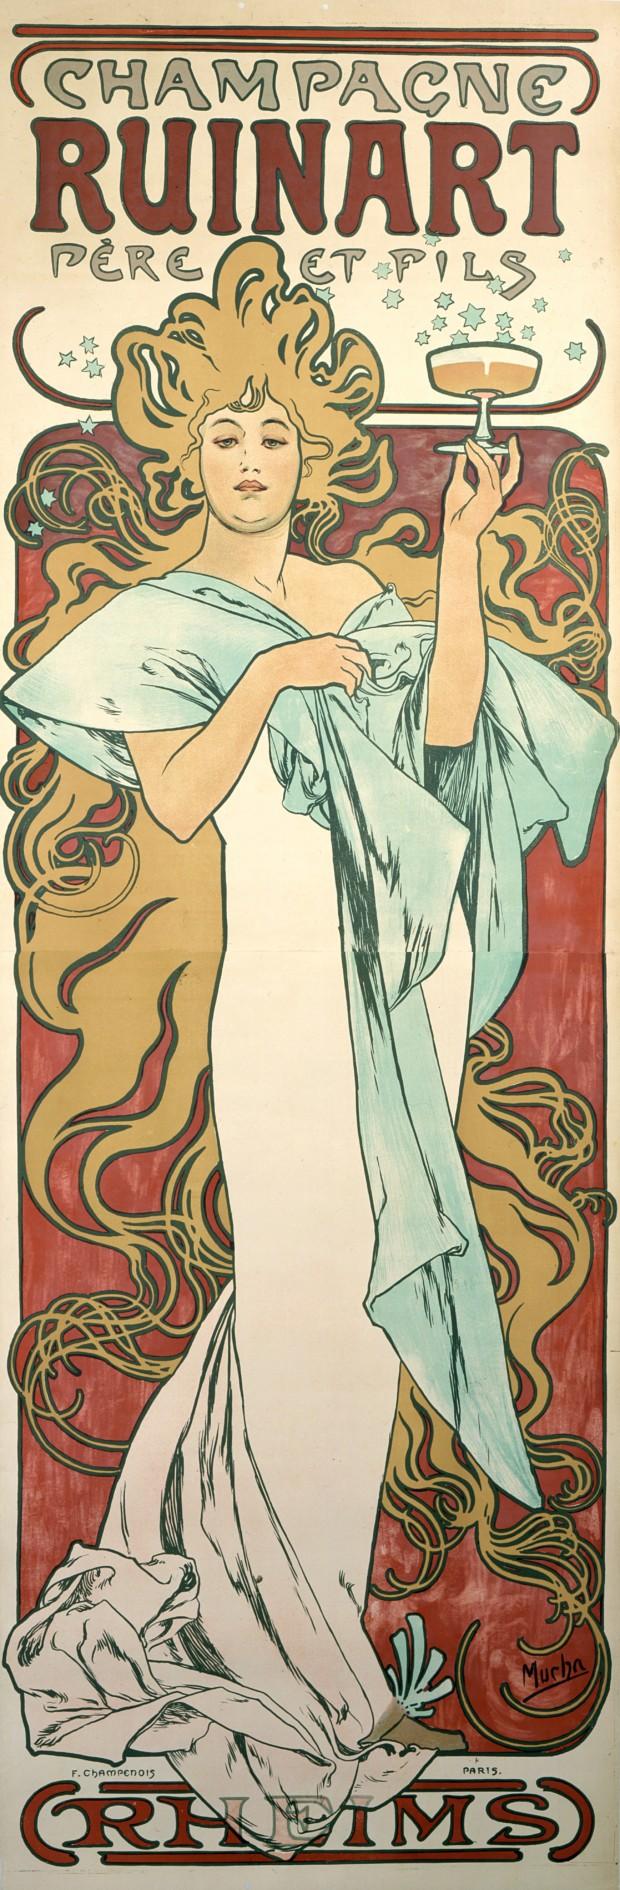 Posters 19th century Alphonse Mucha, Ruinart champagne, 1896